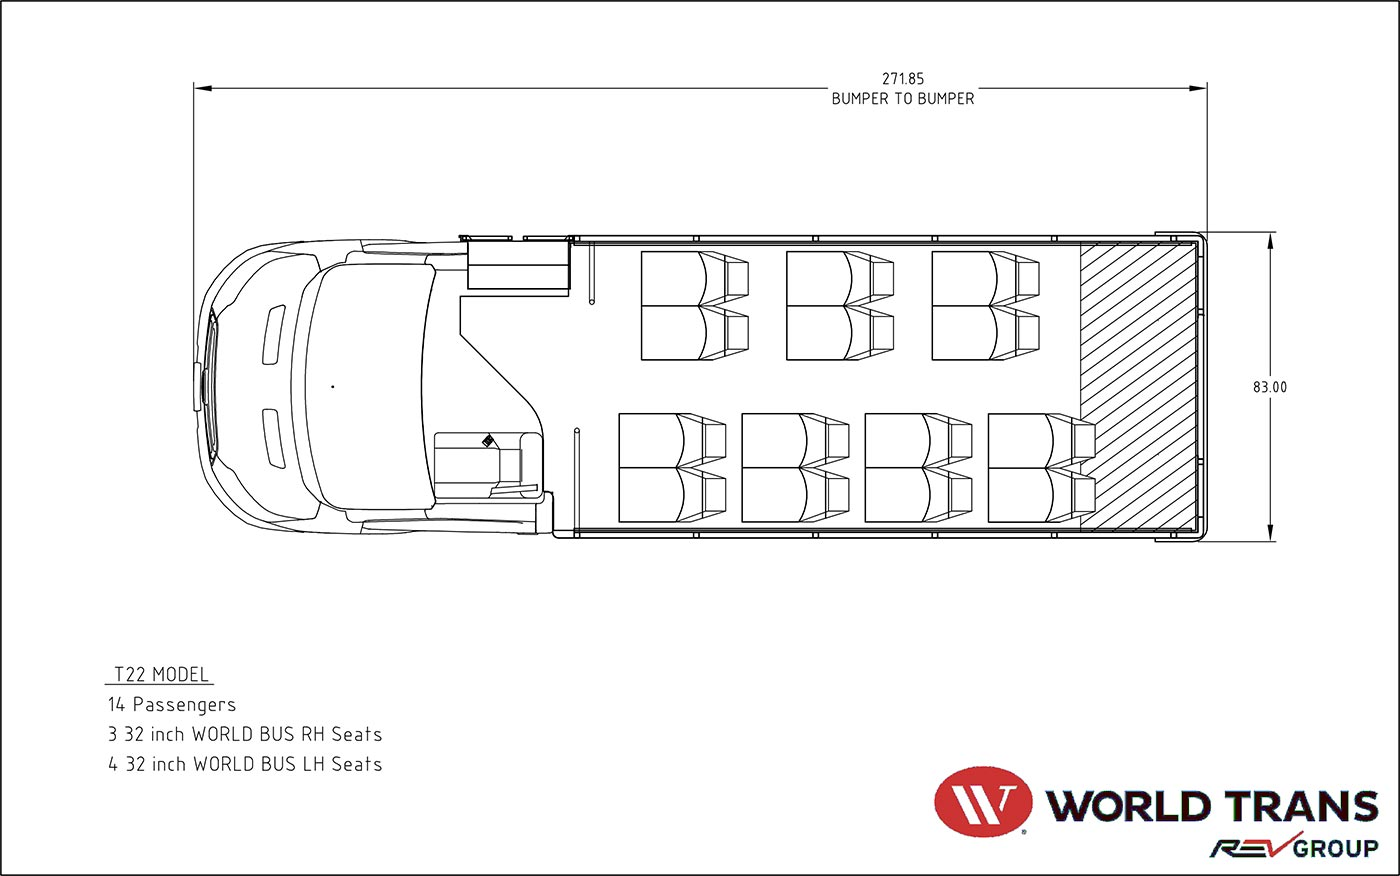 model a trans diagram world trans t series    city view bus sales   service  world trans t series    city view bus